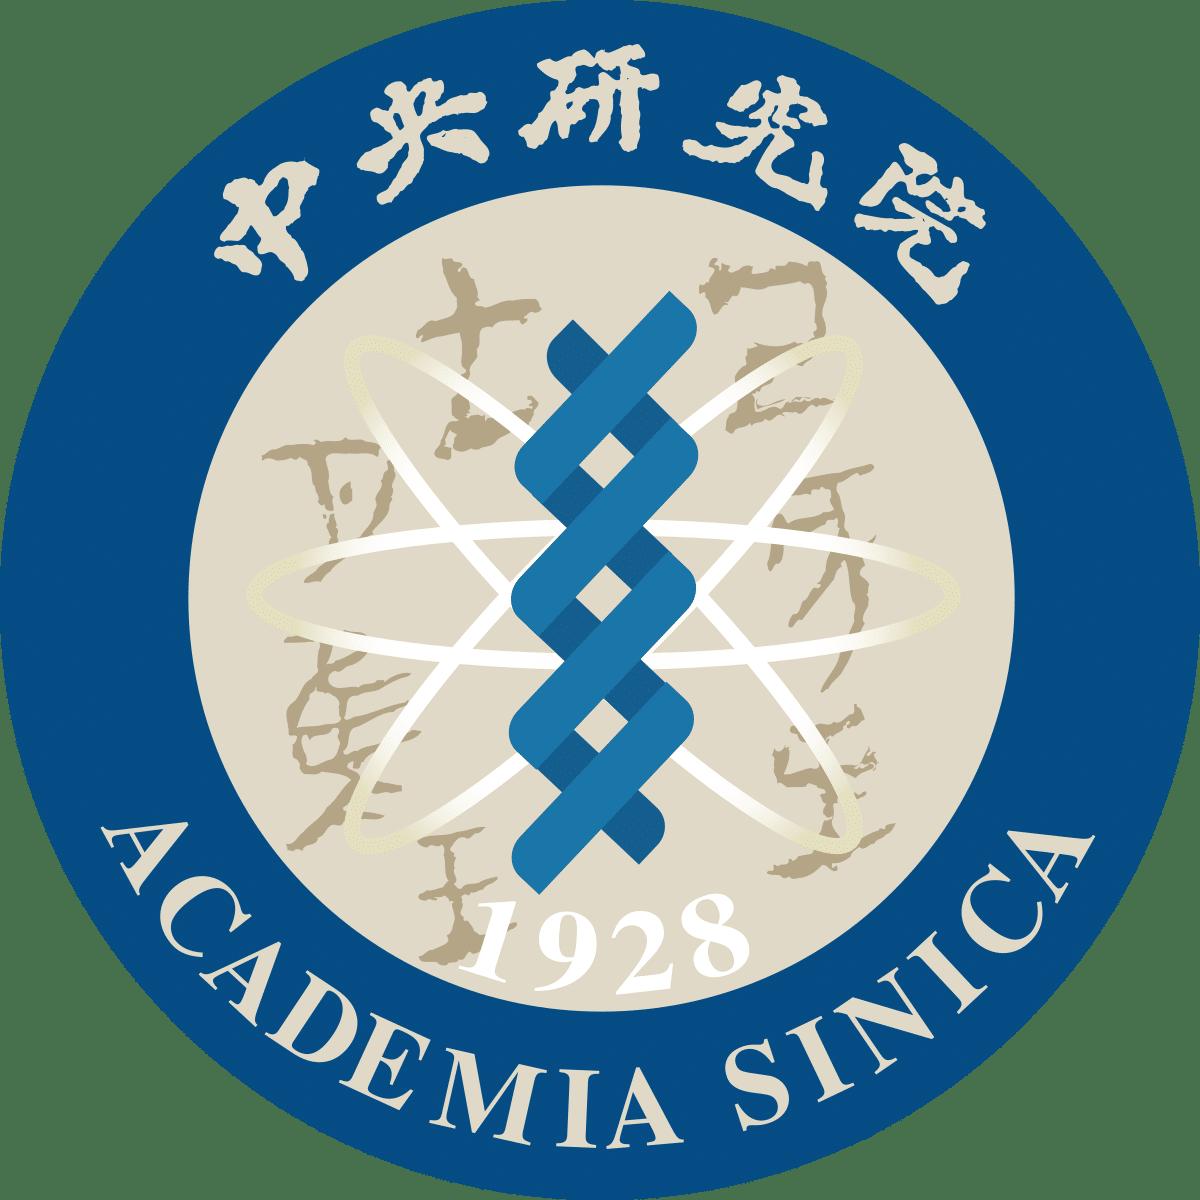 Logo of Academia Sinica (Taiwan)